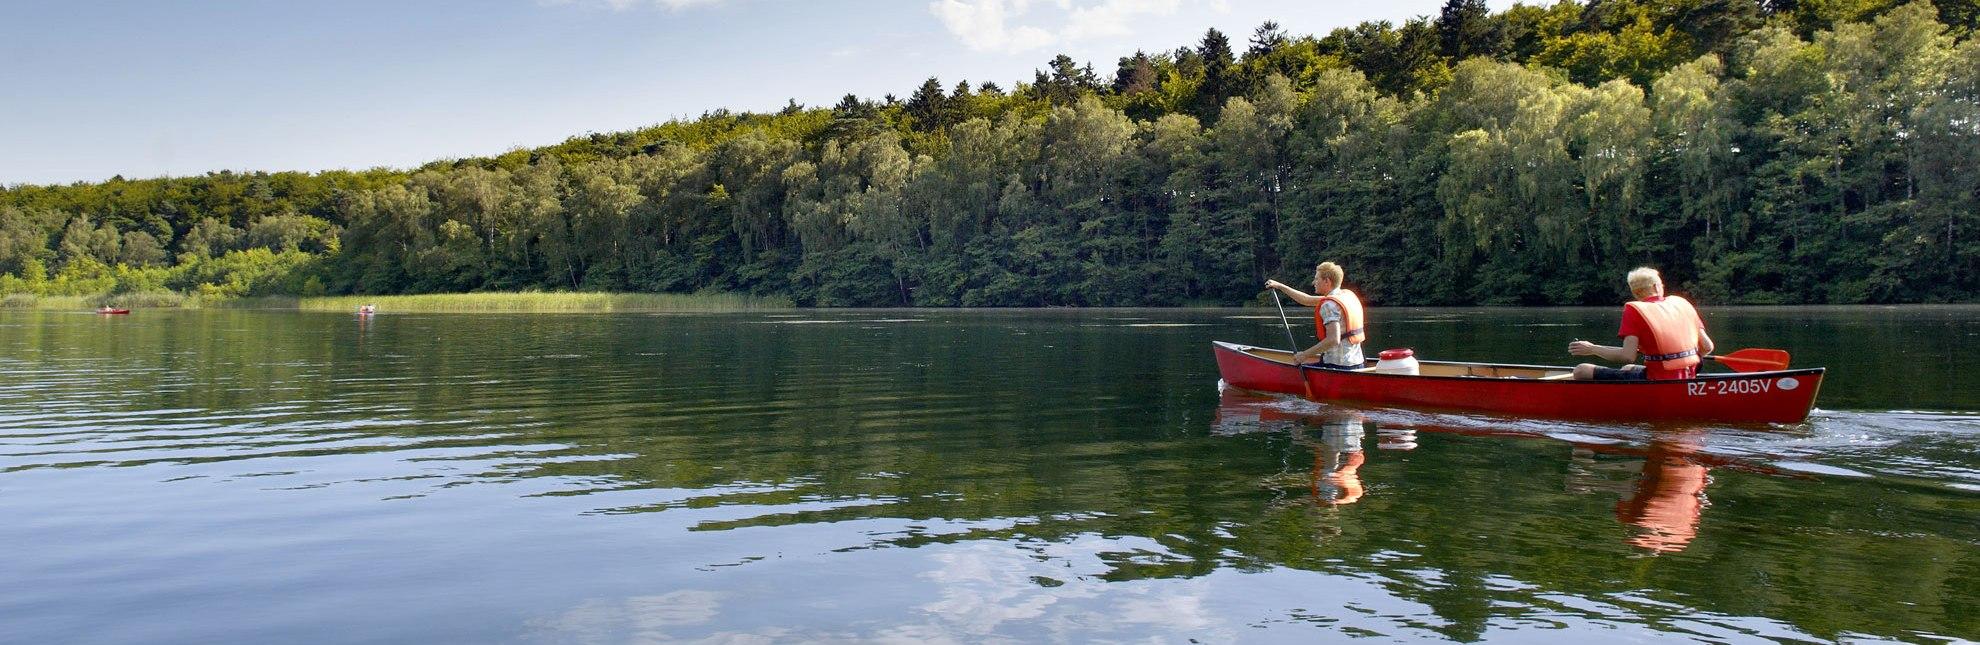 Kanu fahren auf dem Pipersee, © photocompany GmbH